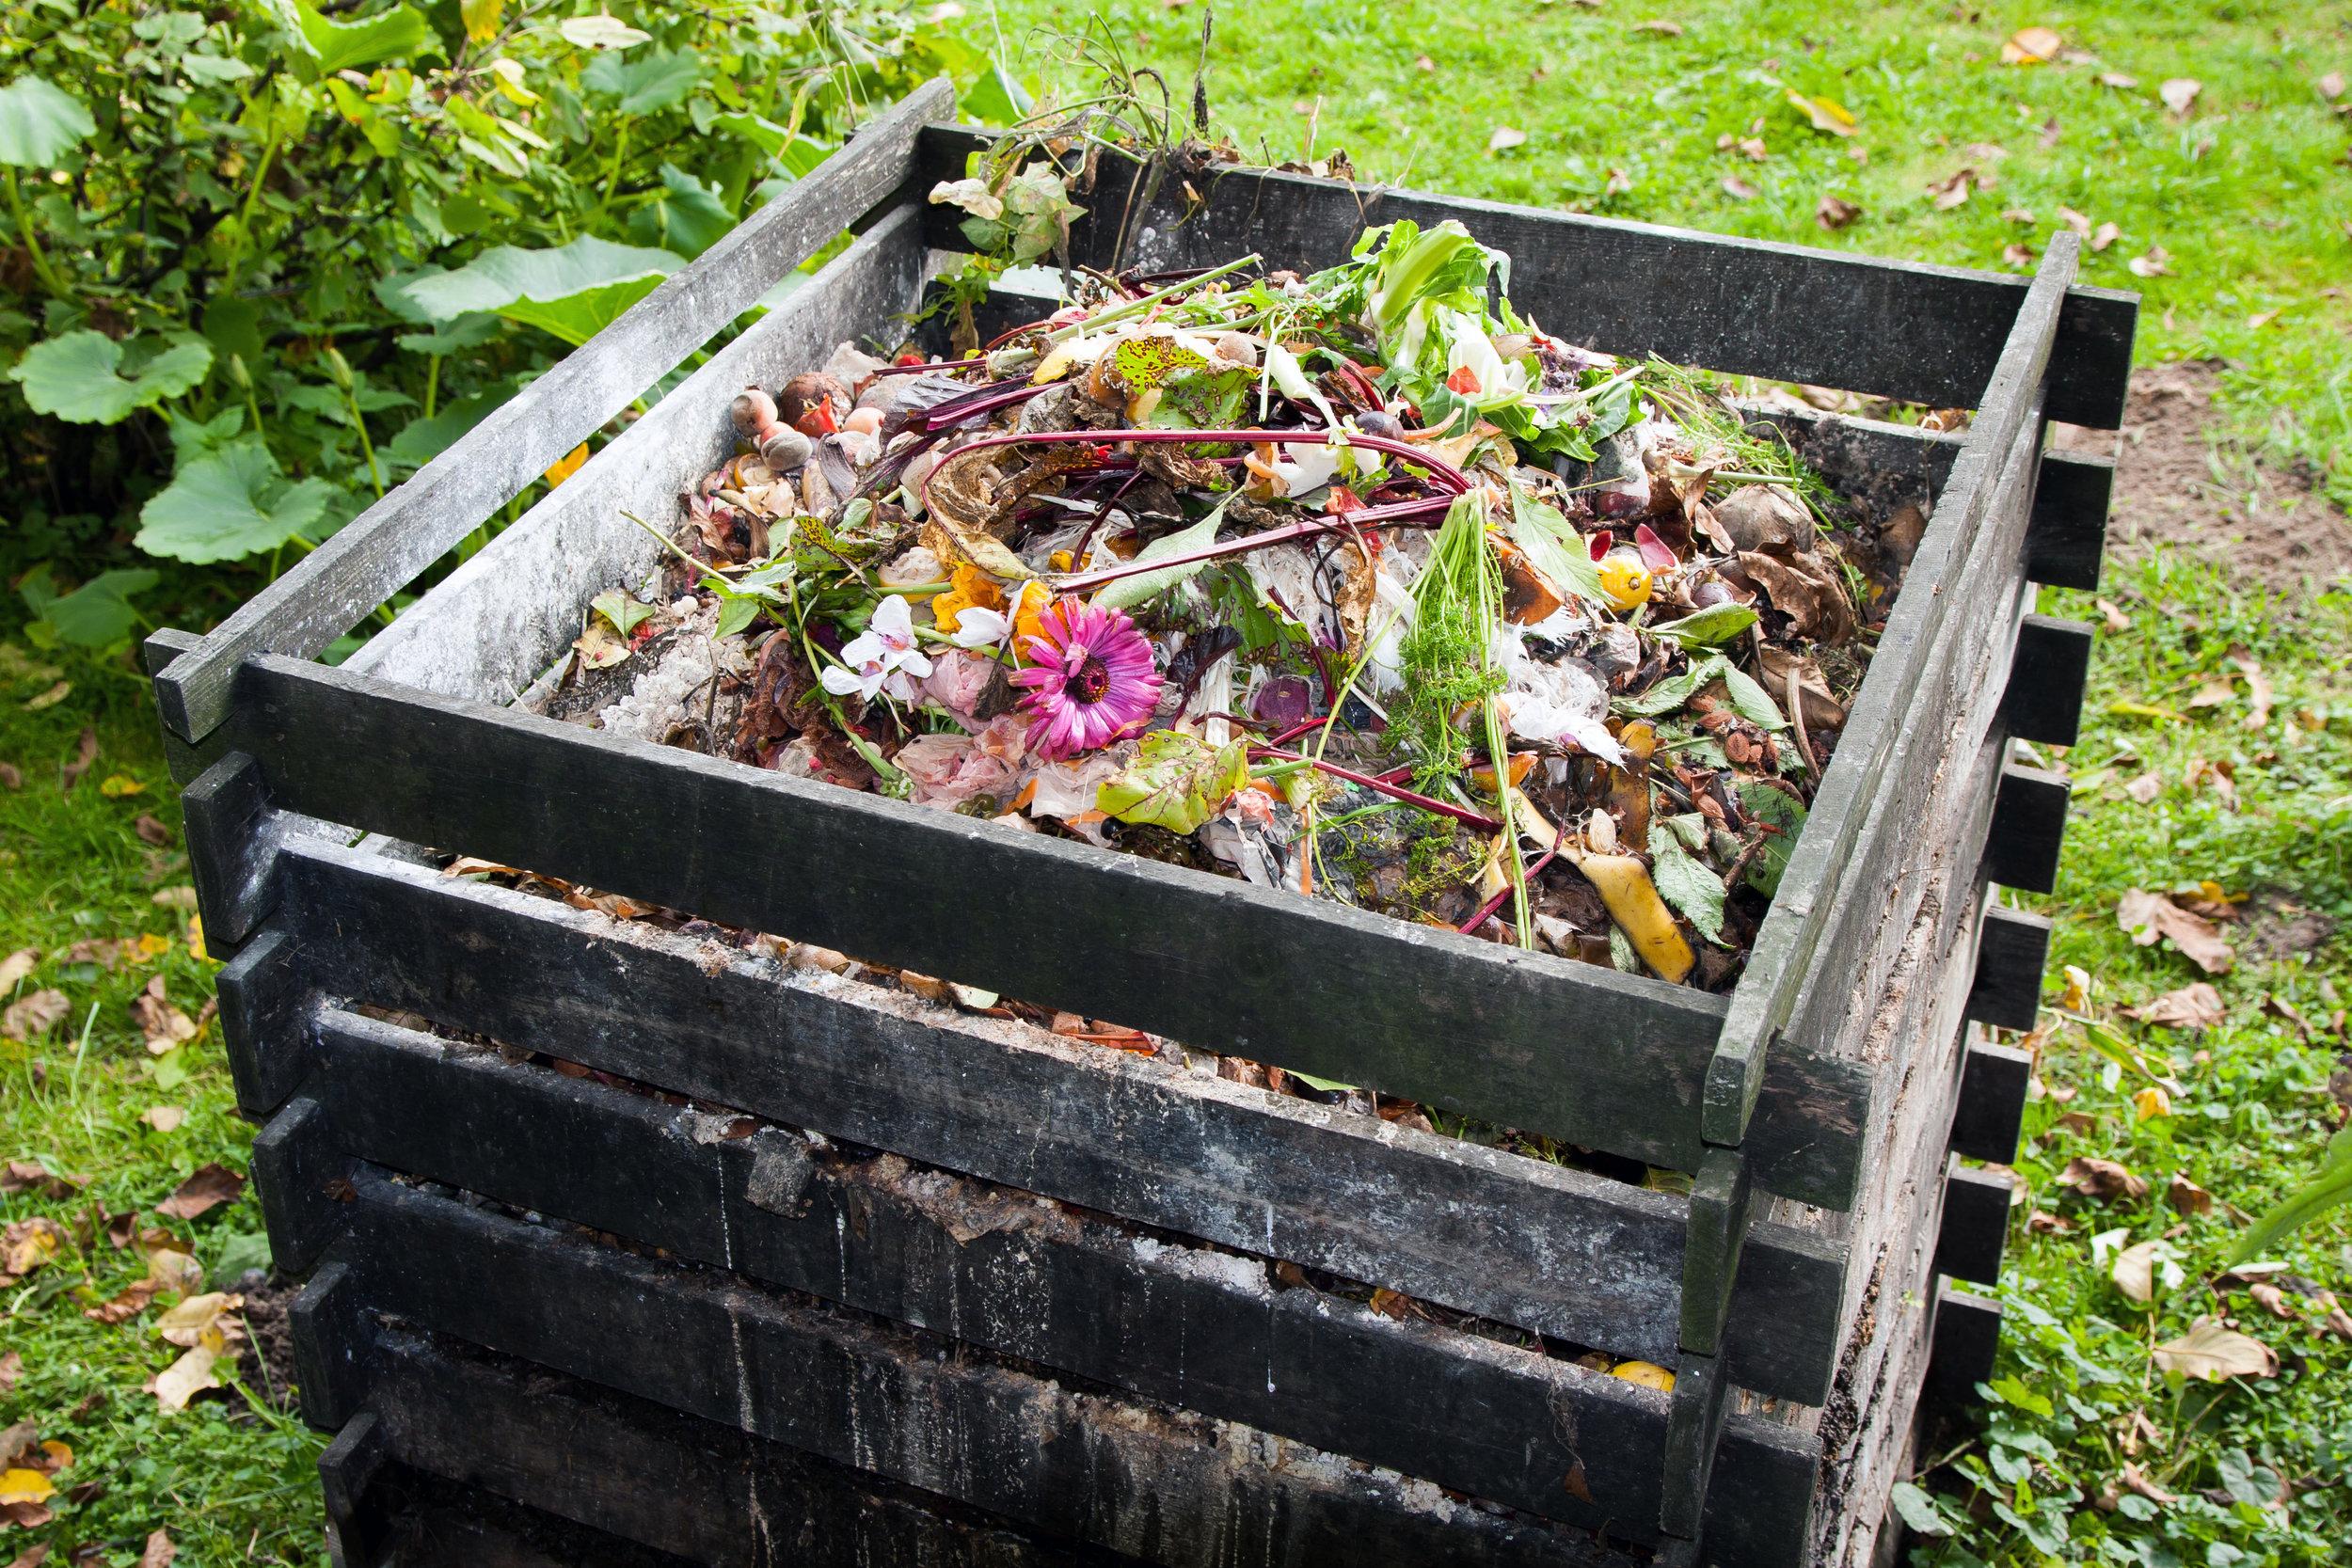 composting-at-work